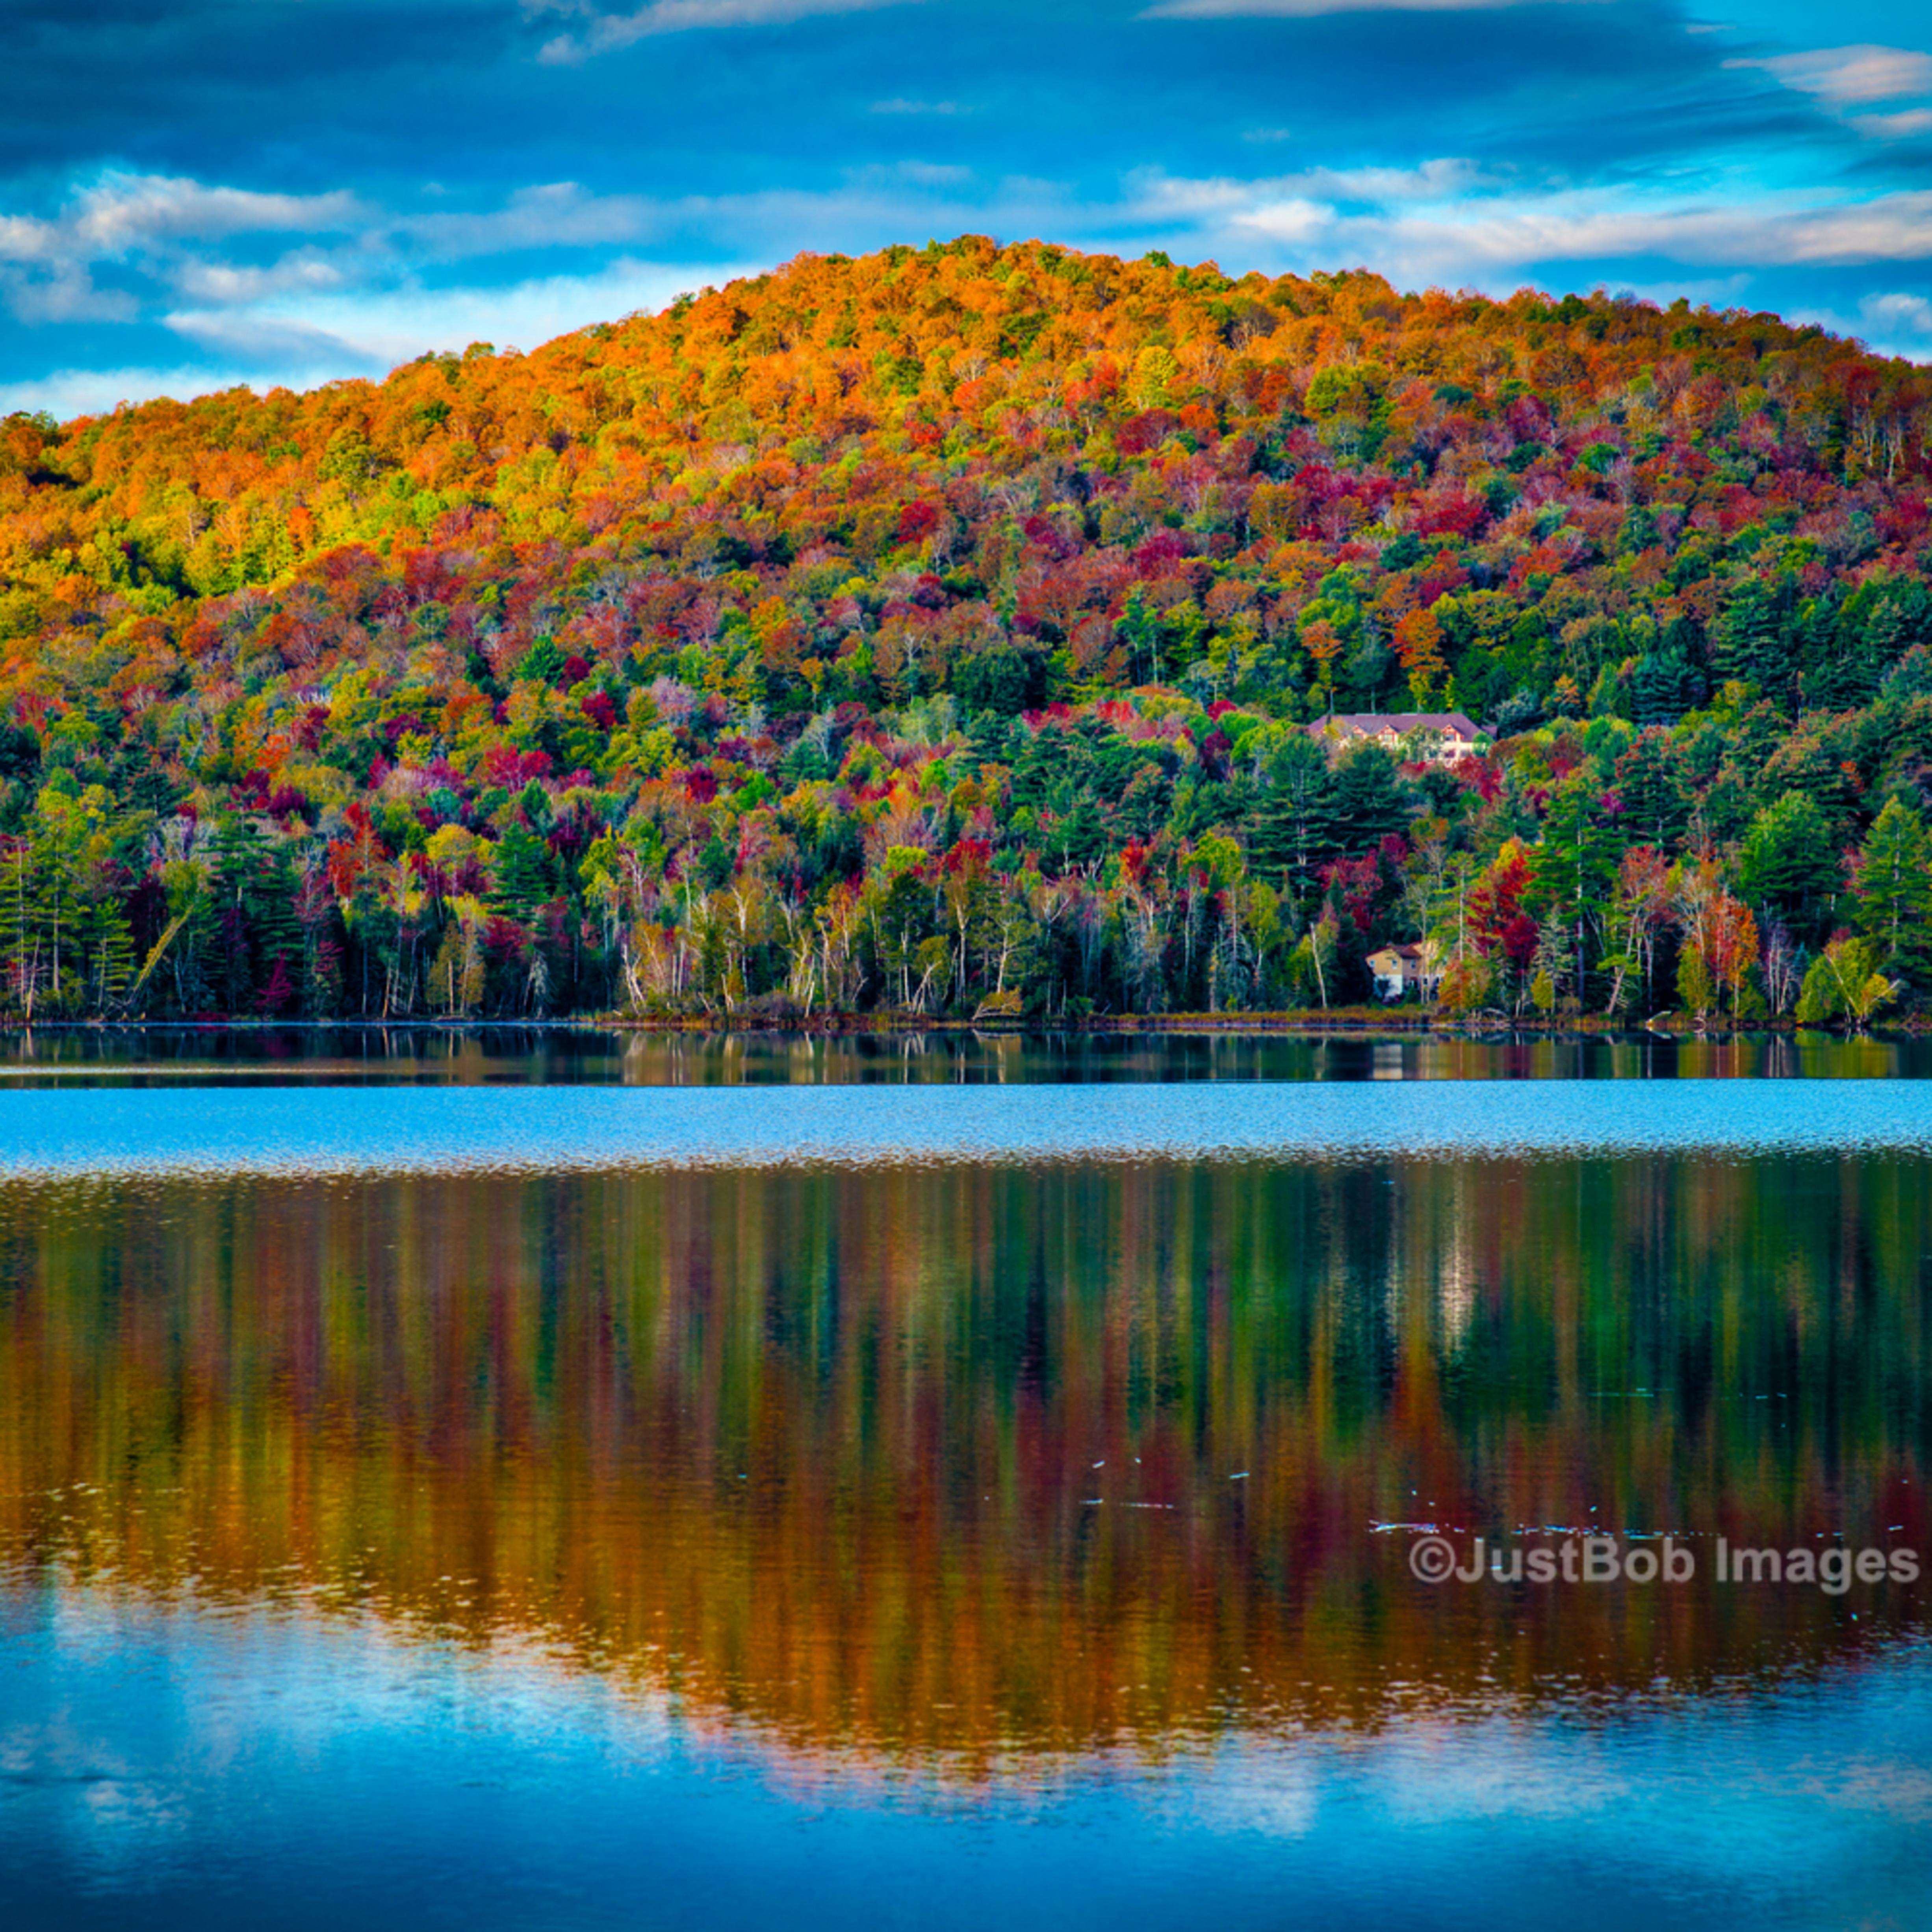 Adirondacks 20171004 0095 aurora2017 hdr hut5ok